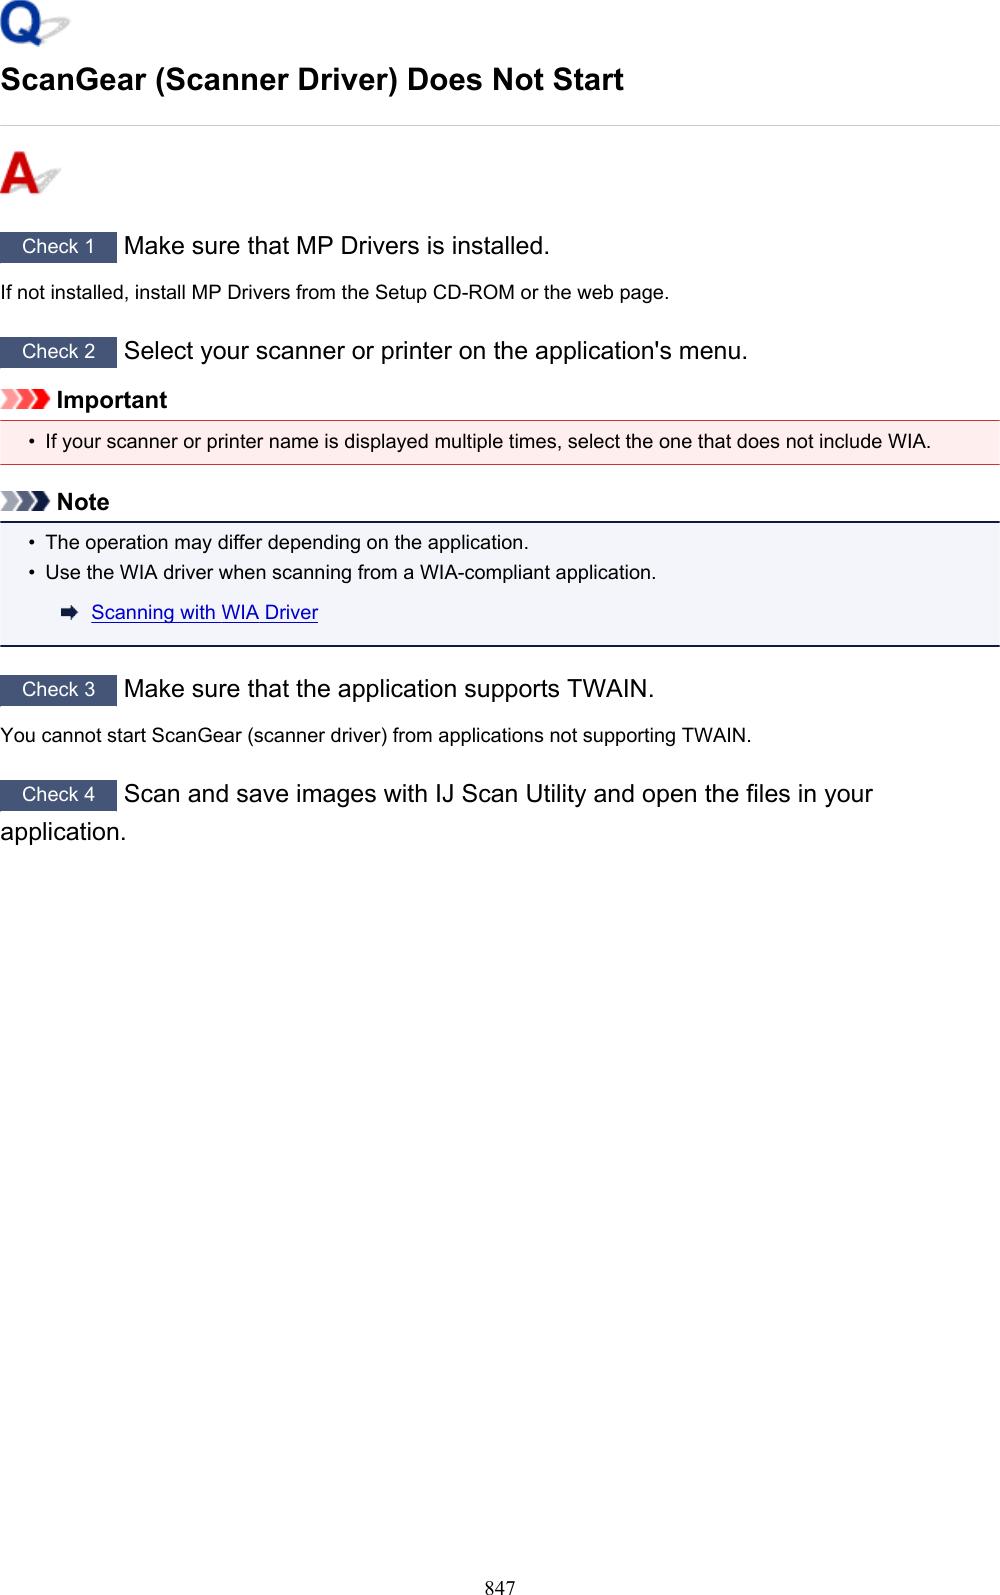 Canon Pixma Mx492 Users Manual